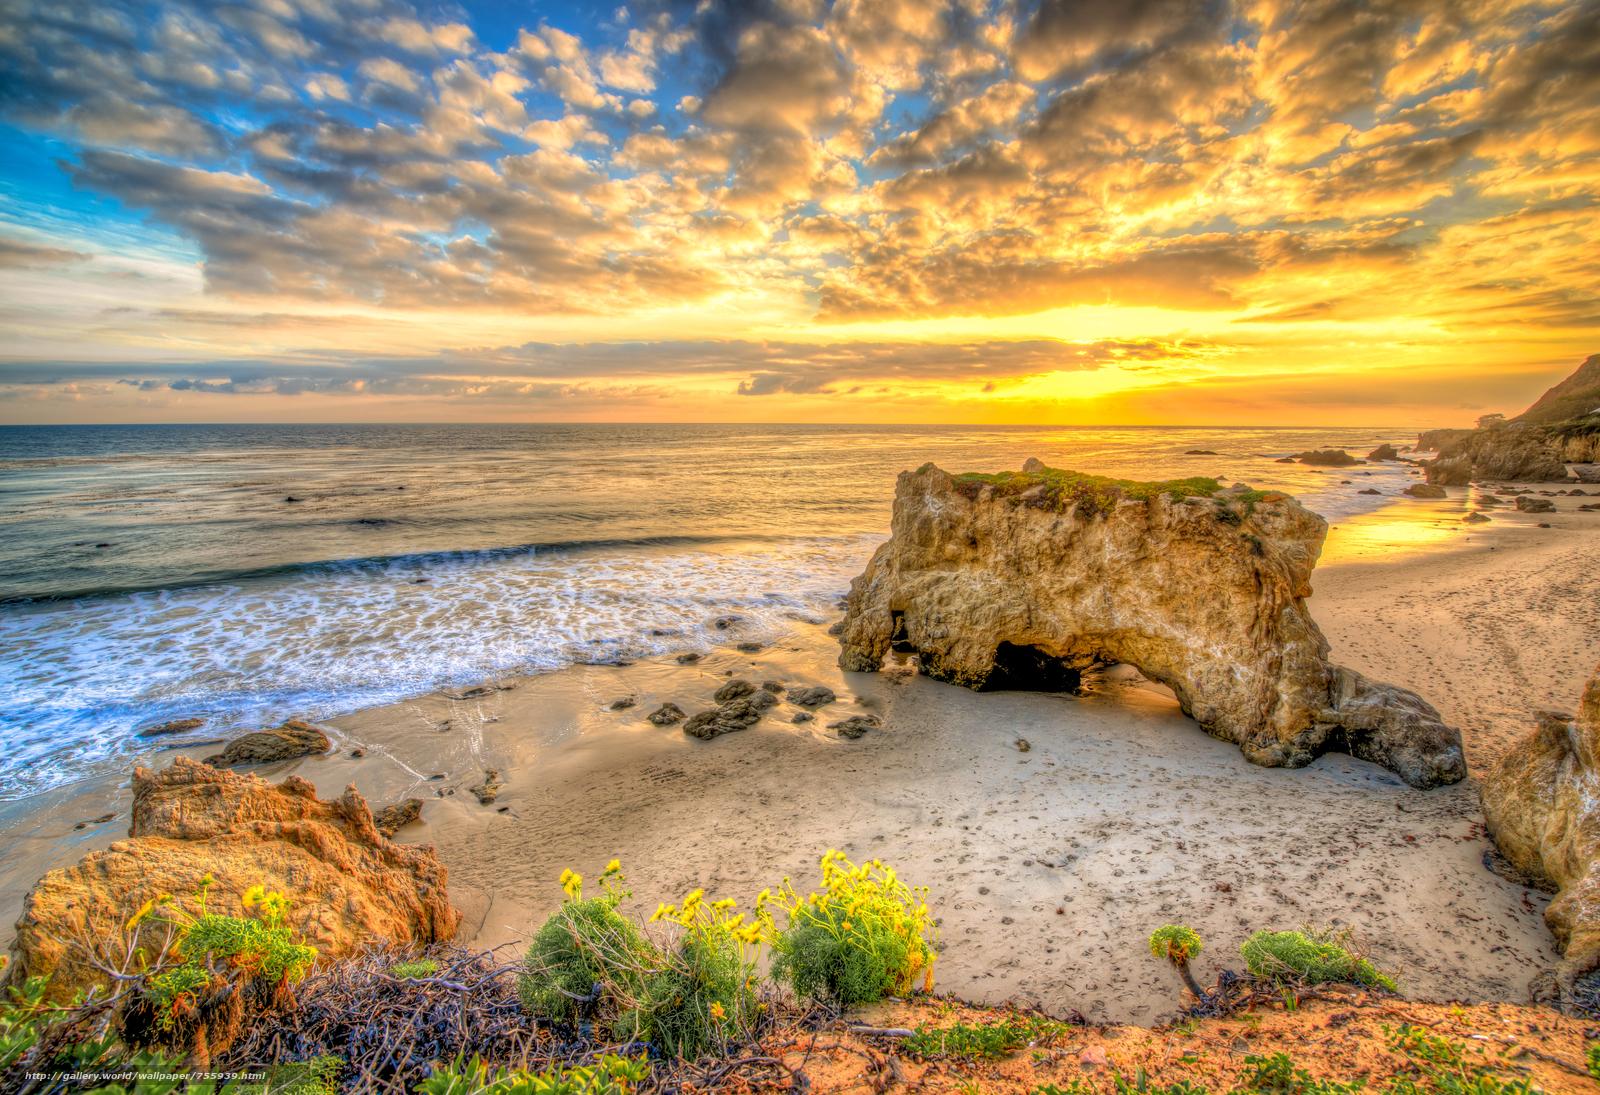 sunset, sea, Coast, beach, Malibu, USA, landscape